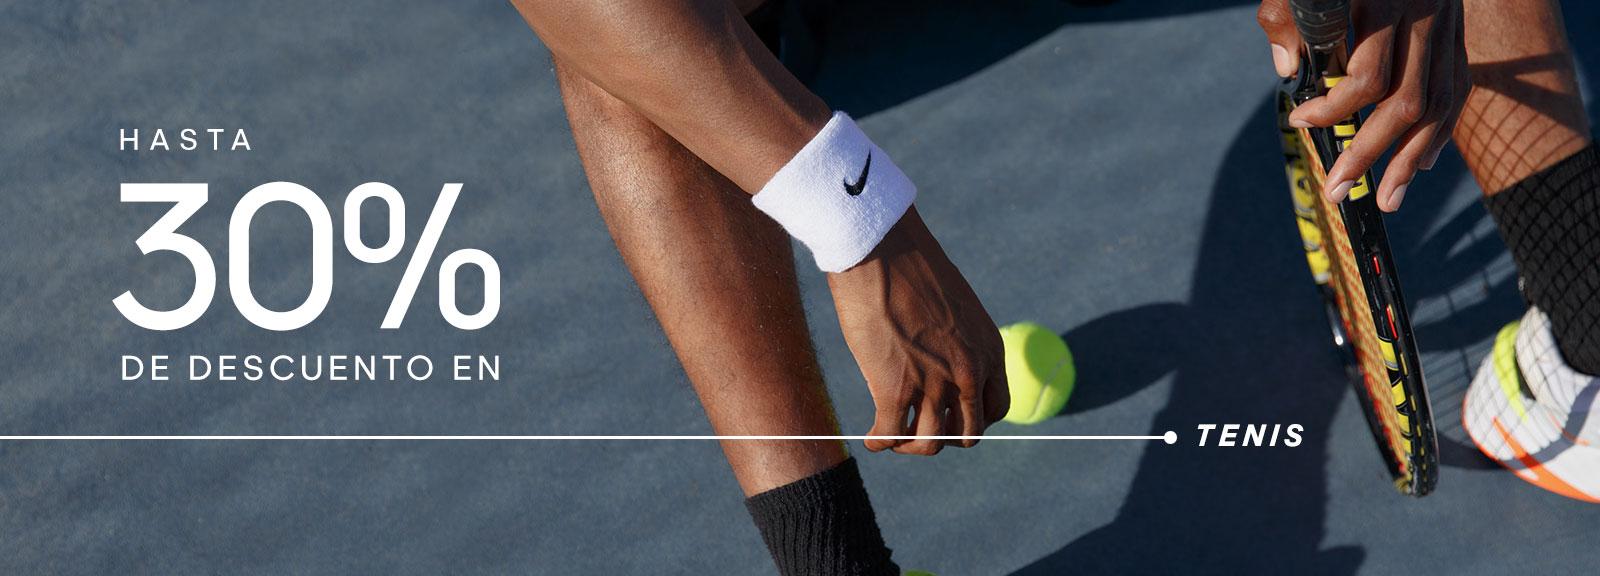 30 tenis